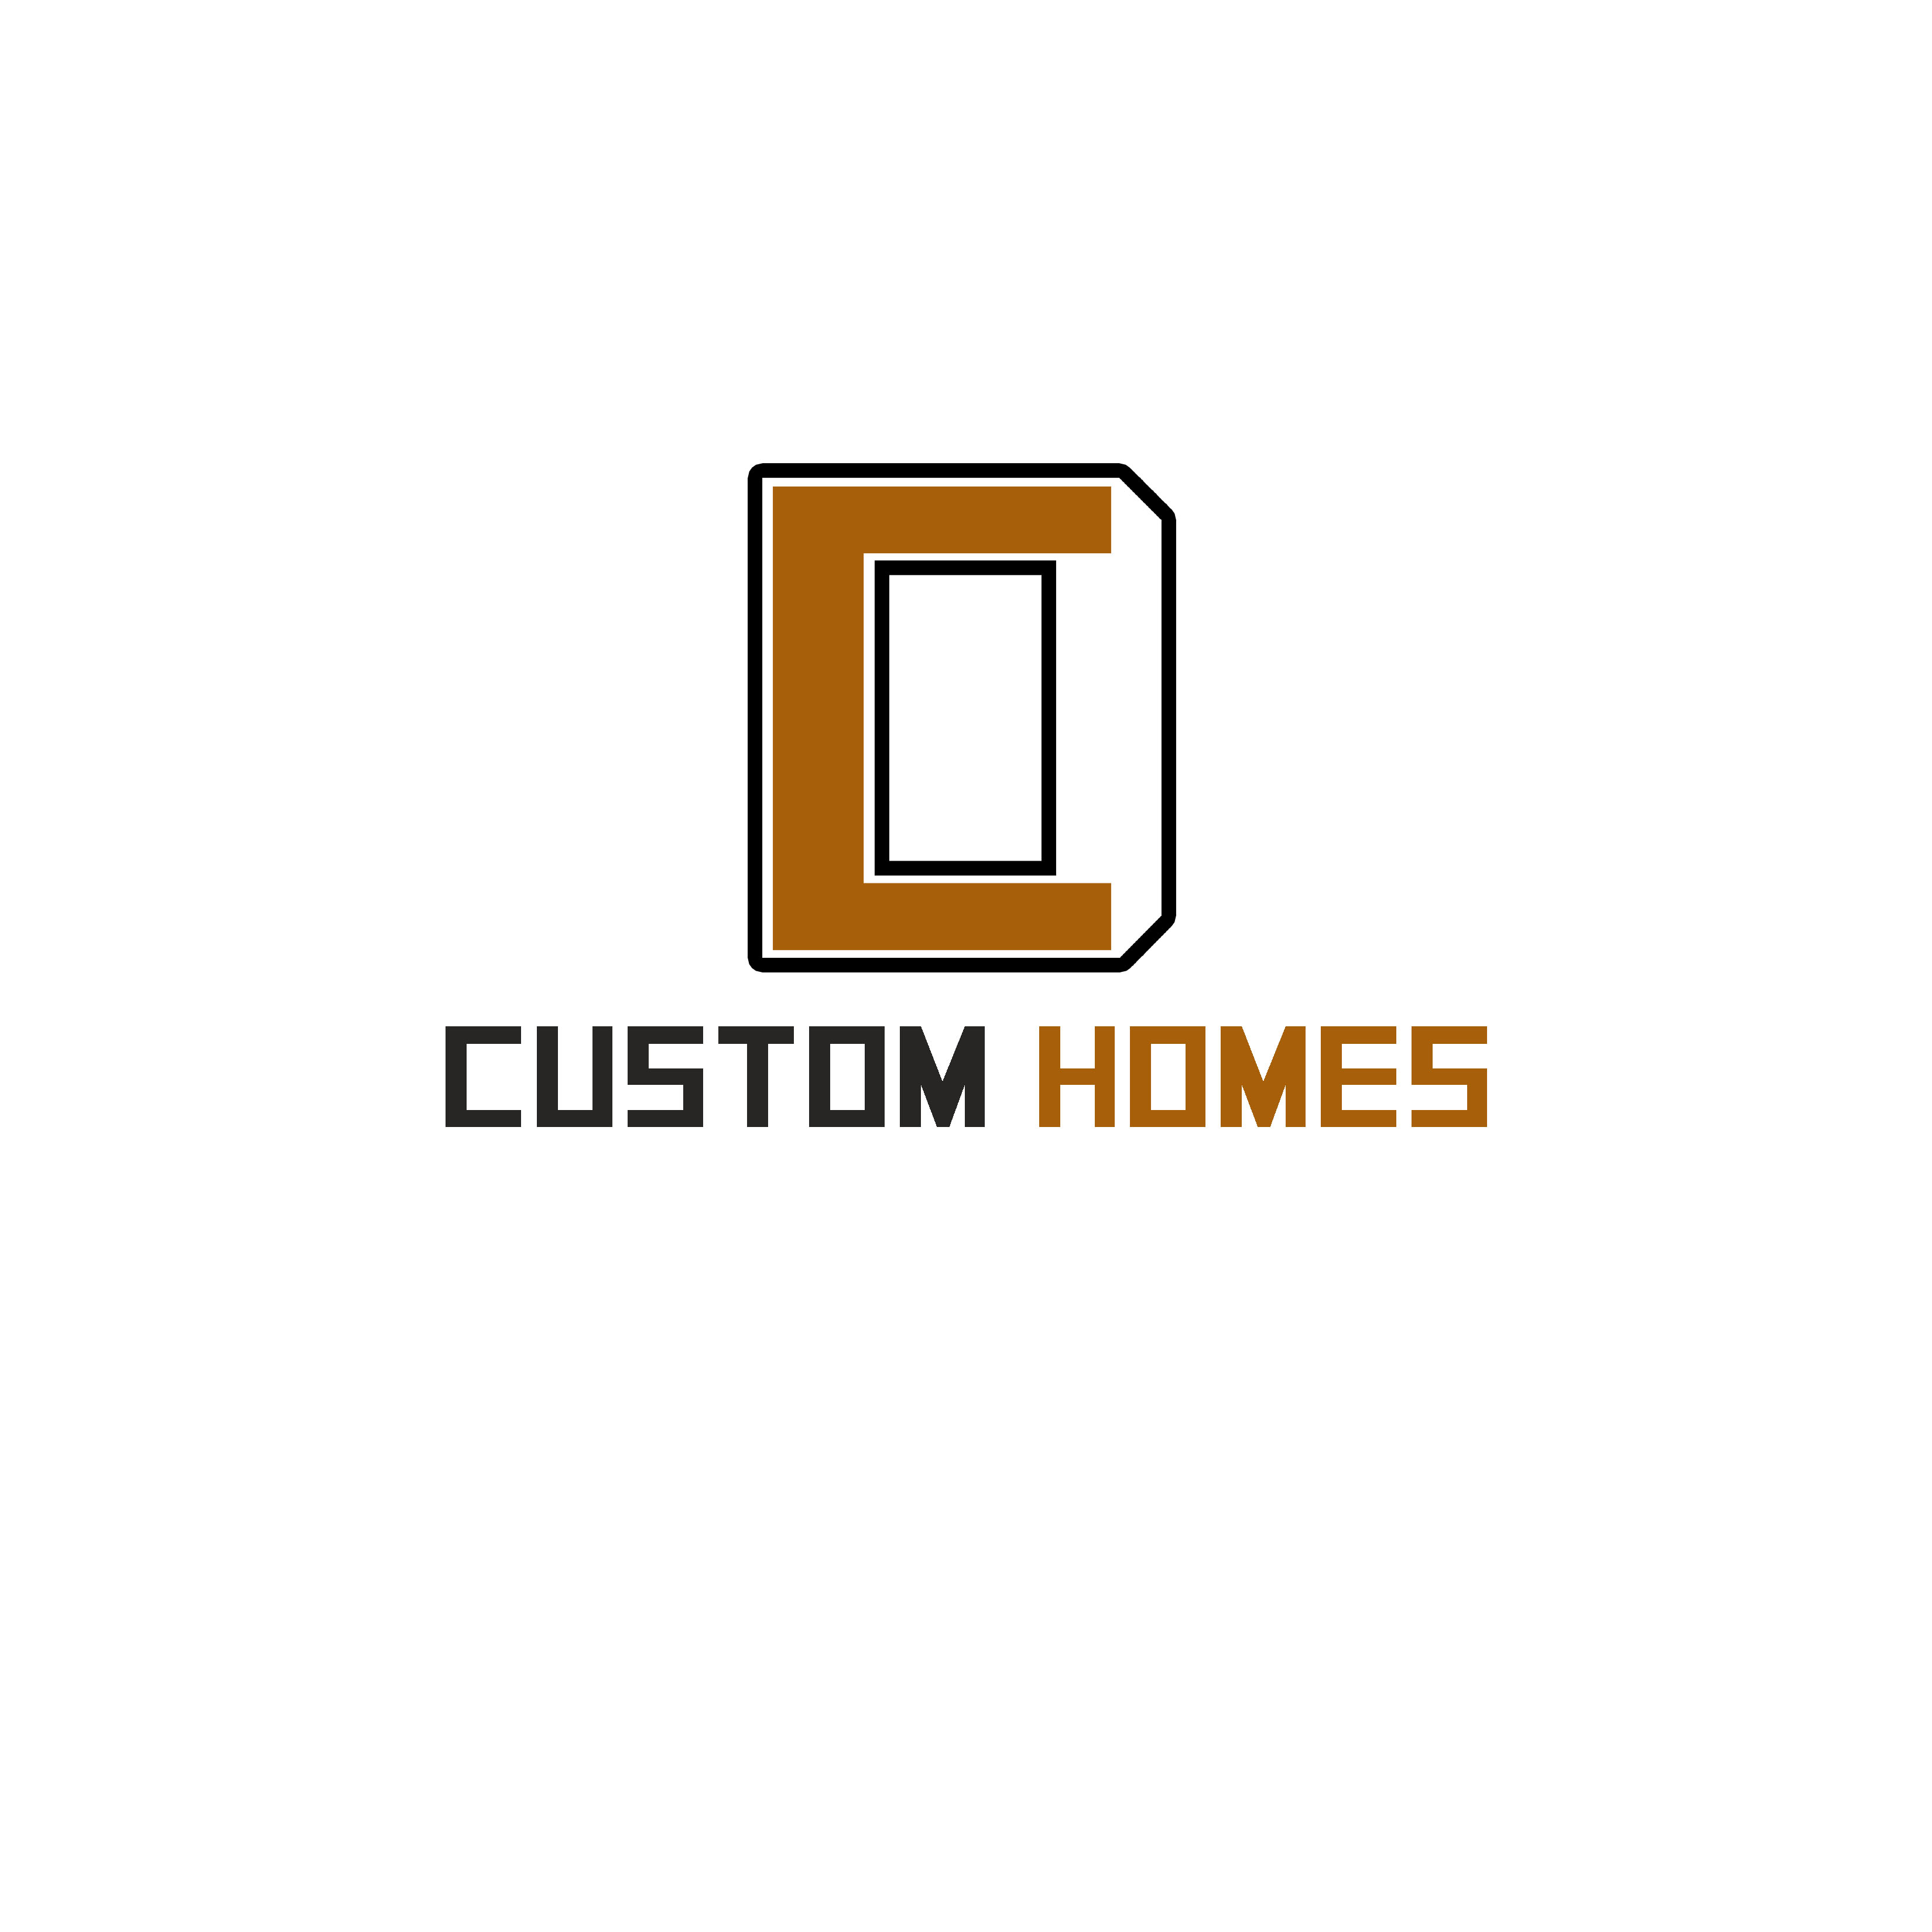 Logo Design by Allan Esclamado - Entry No. 220 in the Logo Design Contest Creative Logo Design for DC Custom Homes.